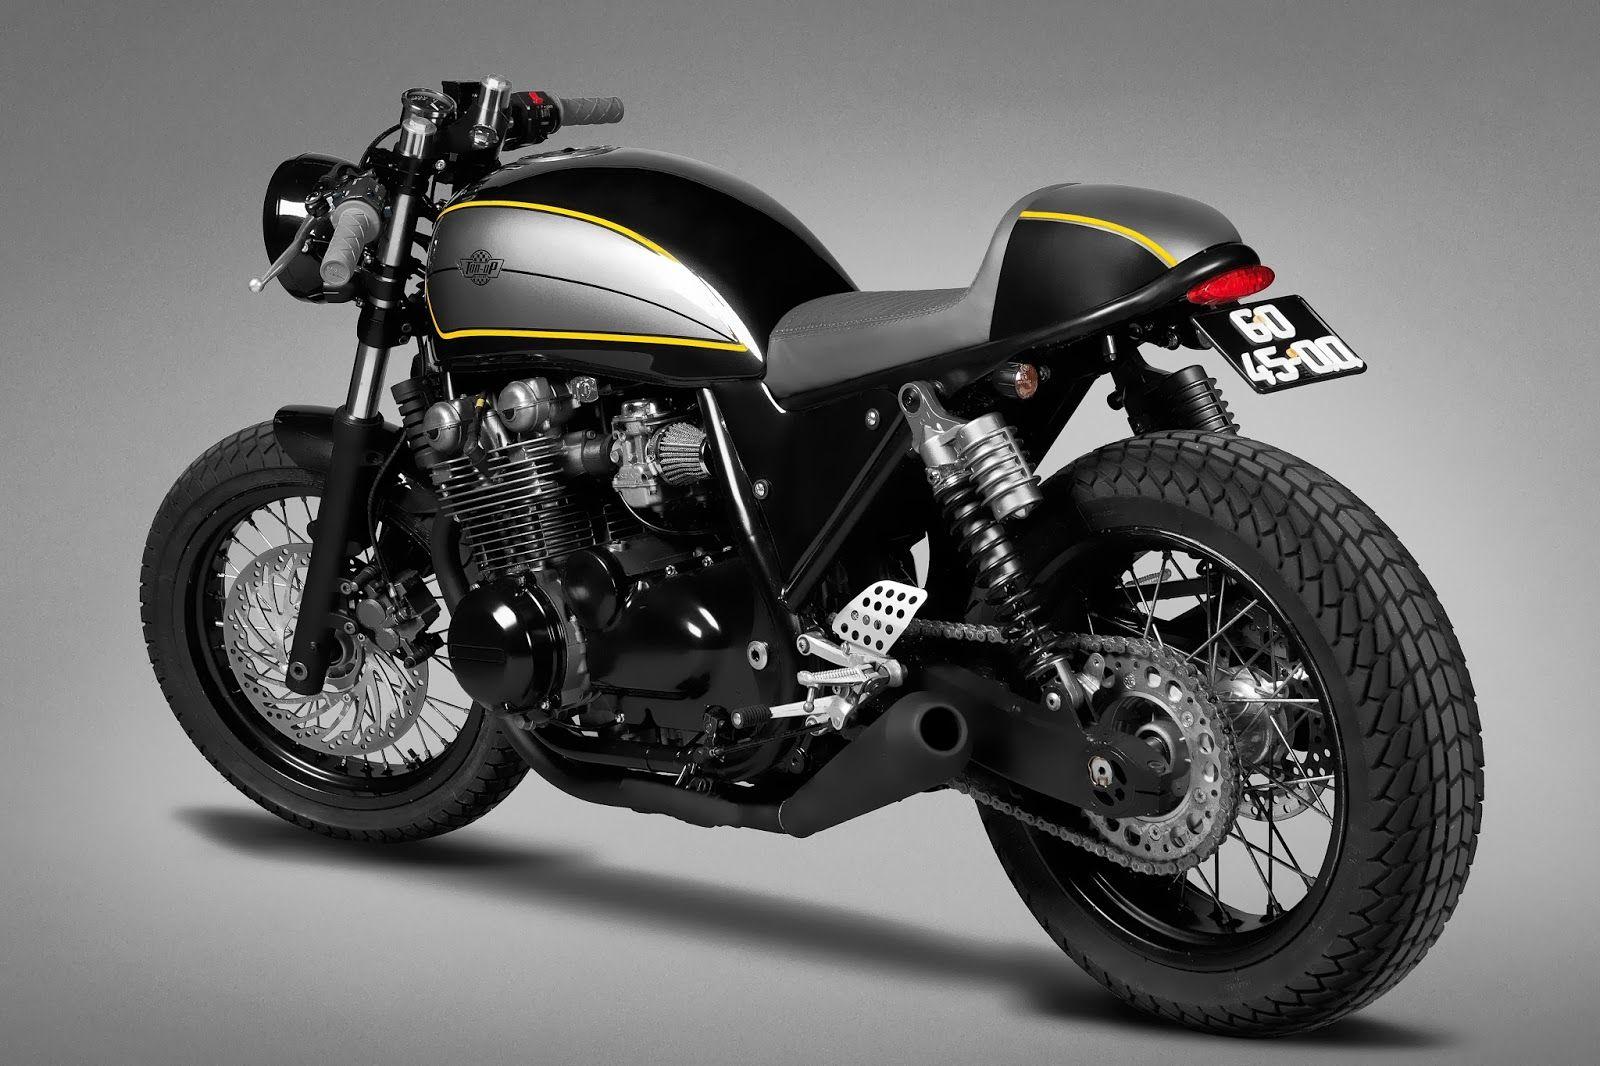 kawasaki zephyr heritage - moto neo-retro 738cc | cafe racer bikes